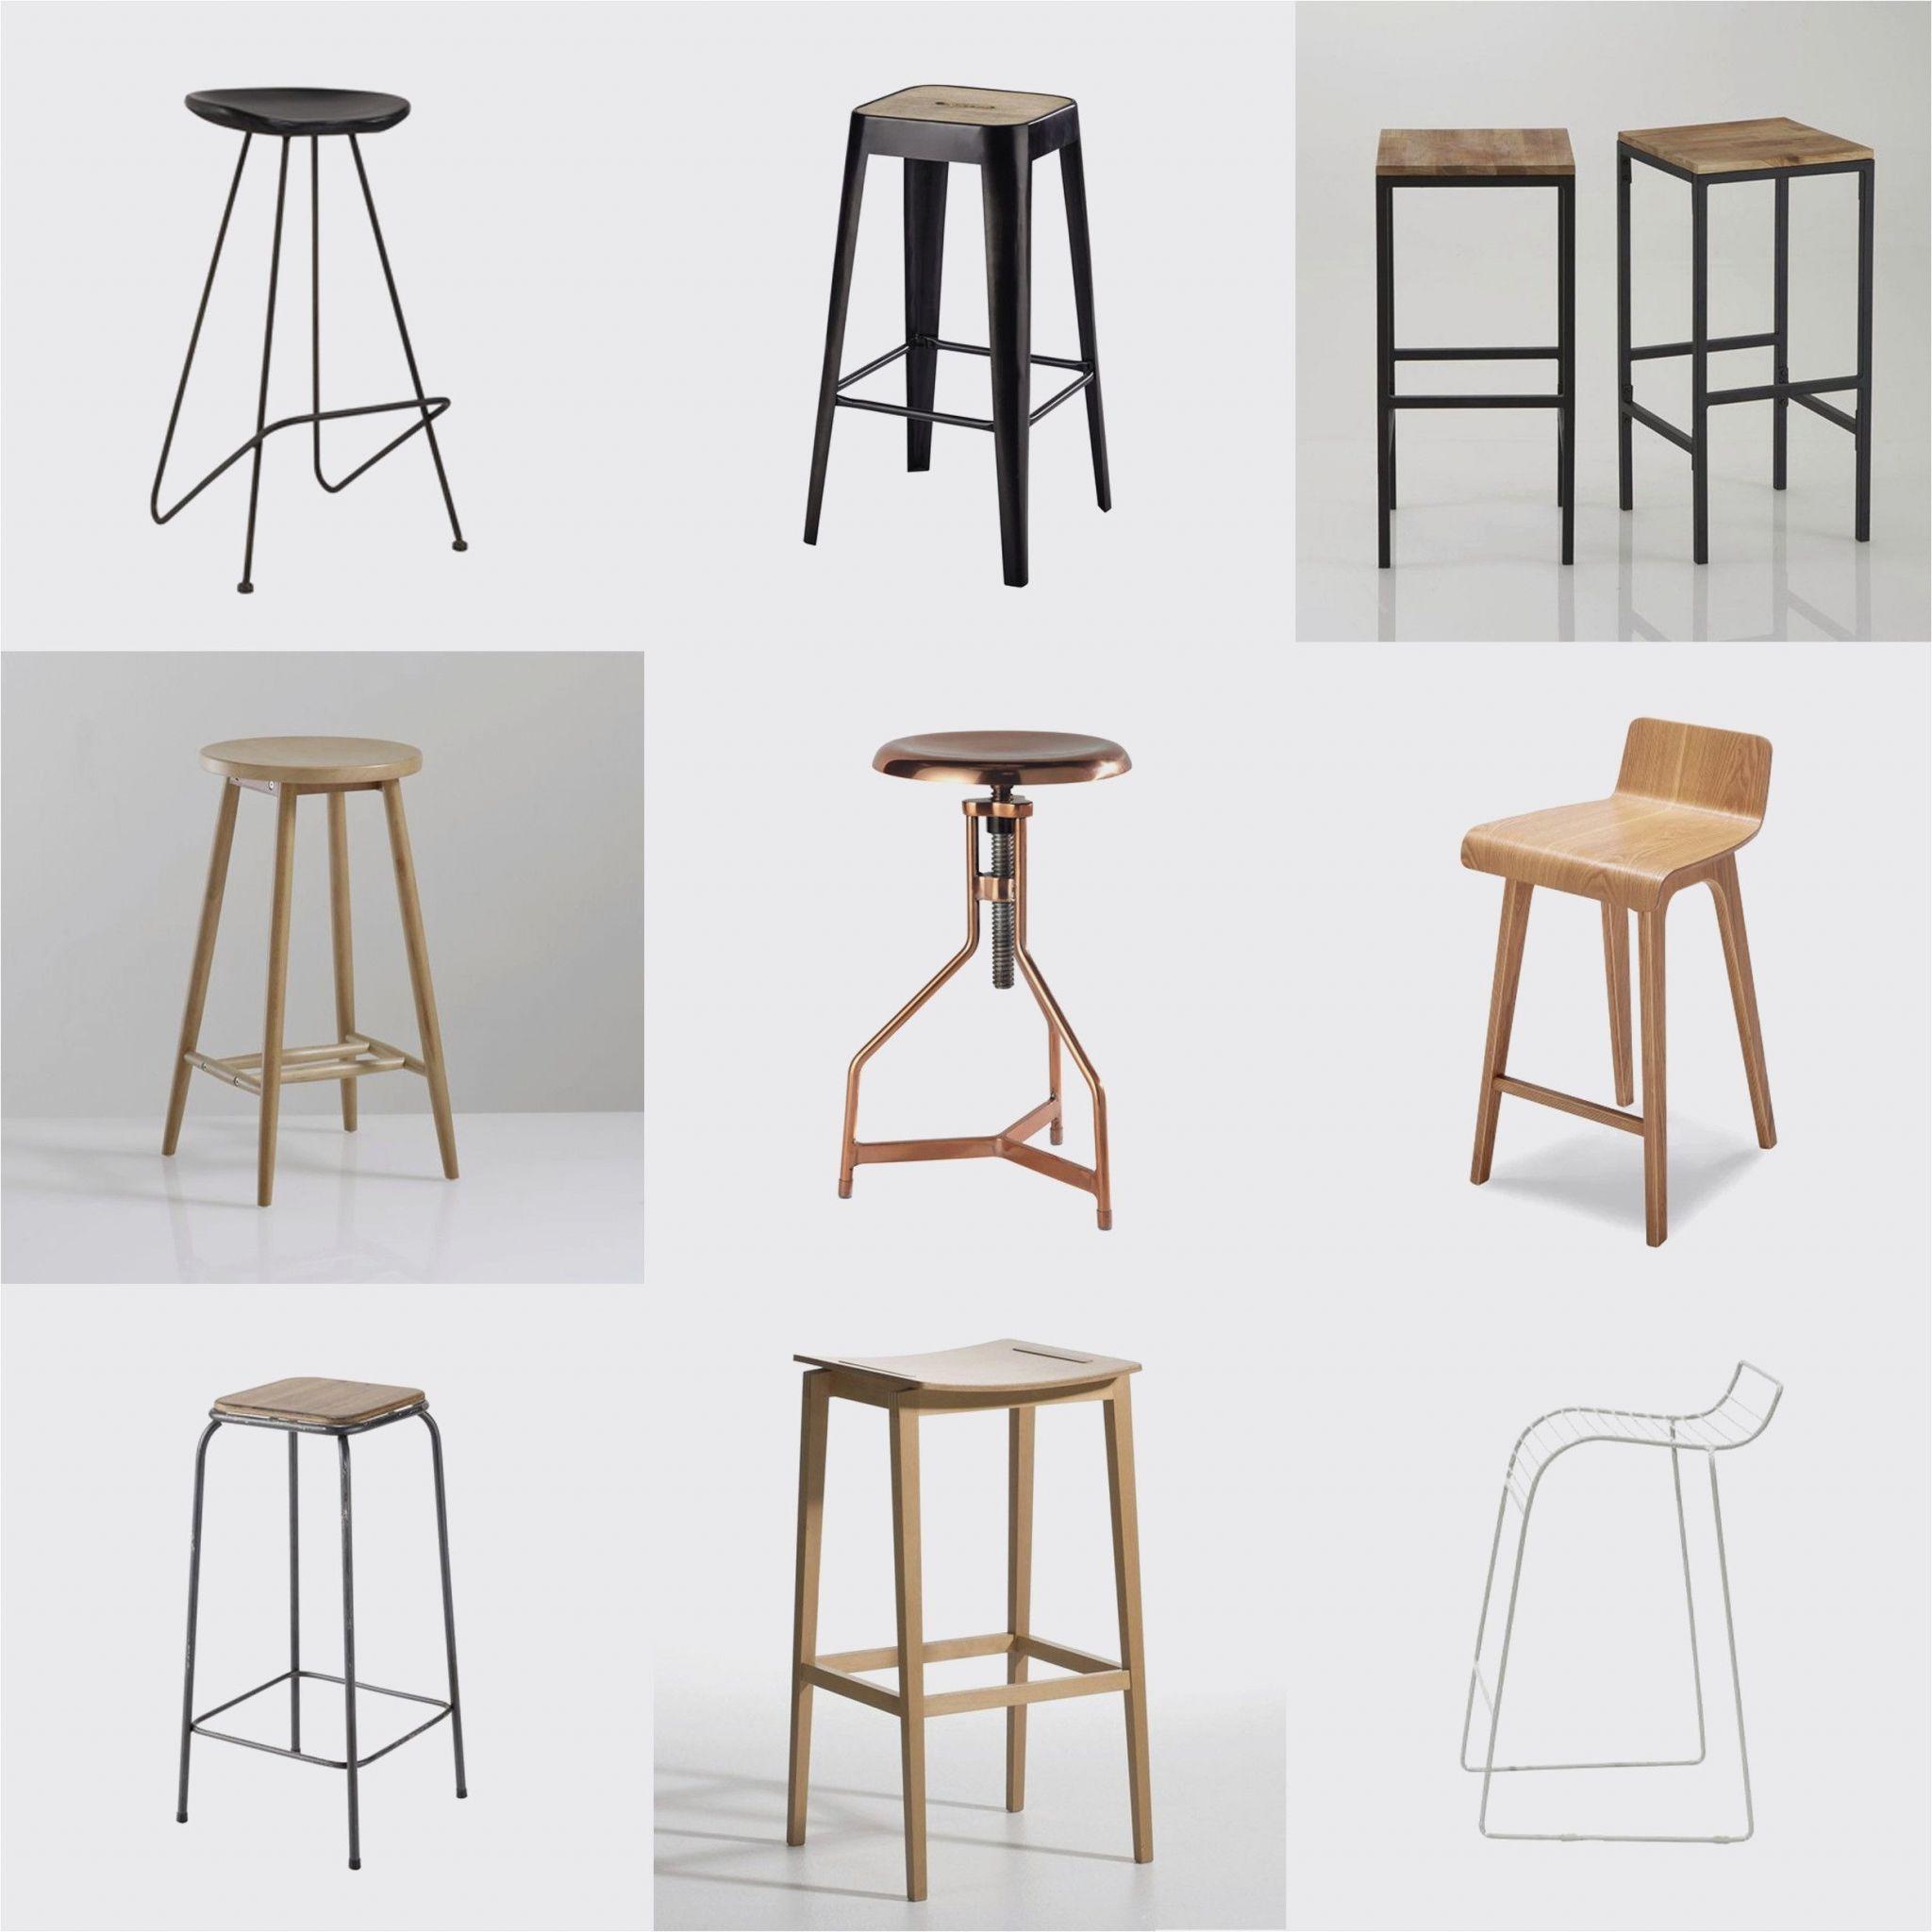 matelas de jardin leroy merlin et leroy merlin chaise jardin chaise aluminium inspirant 20 frais de matelas de jardin leroy merlin